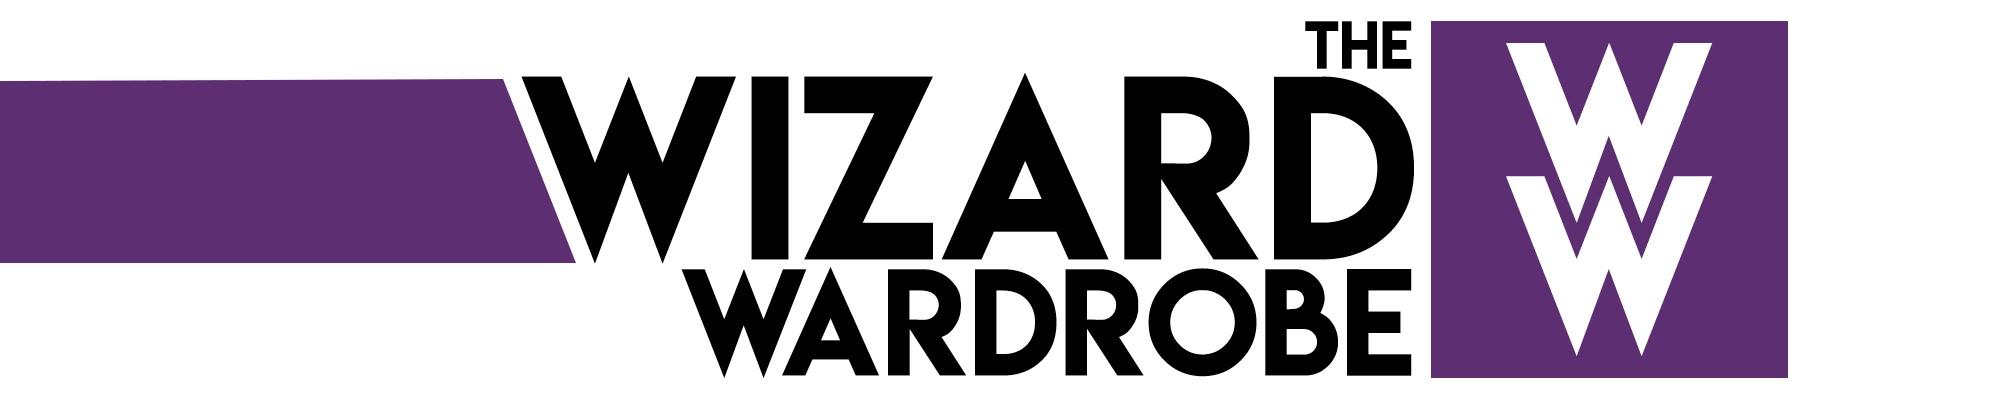 TheWizardWardrobe Cover